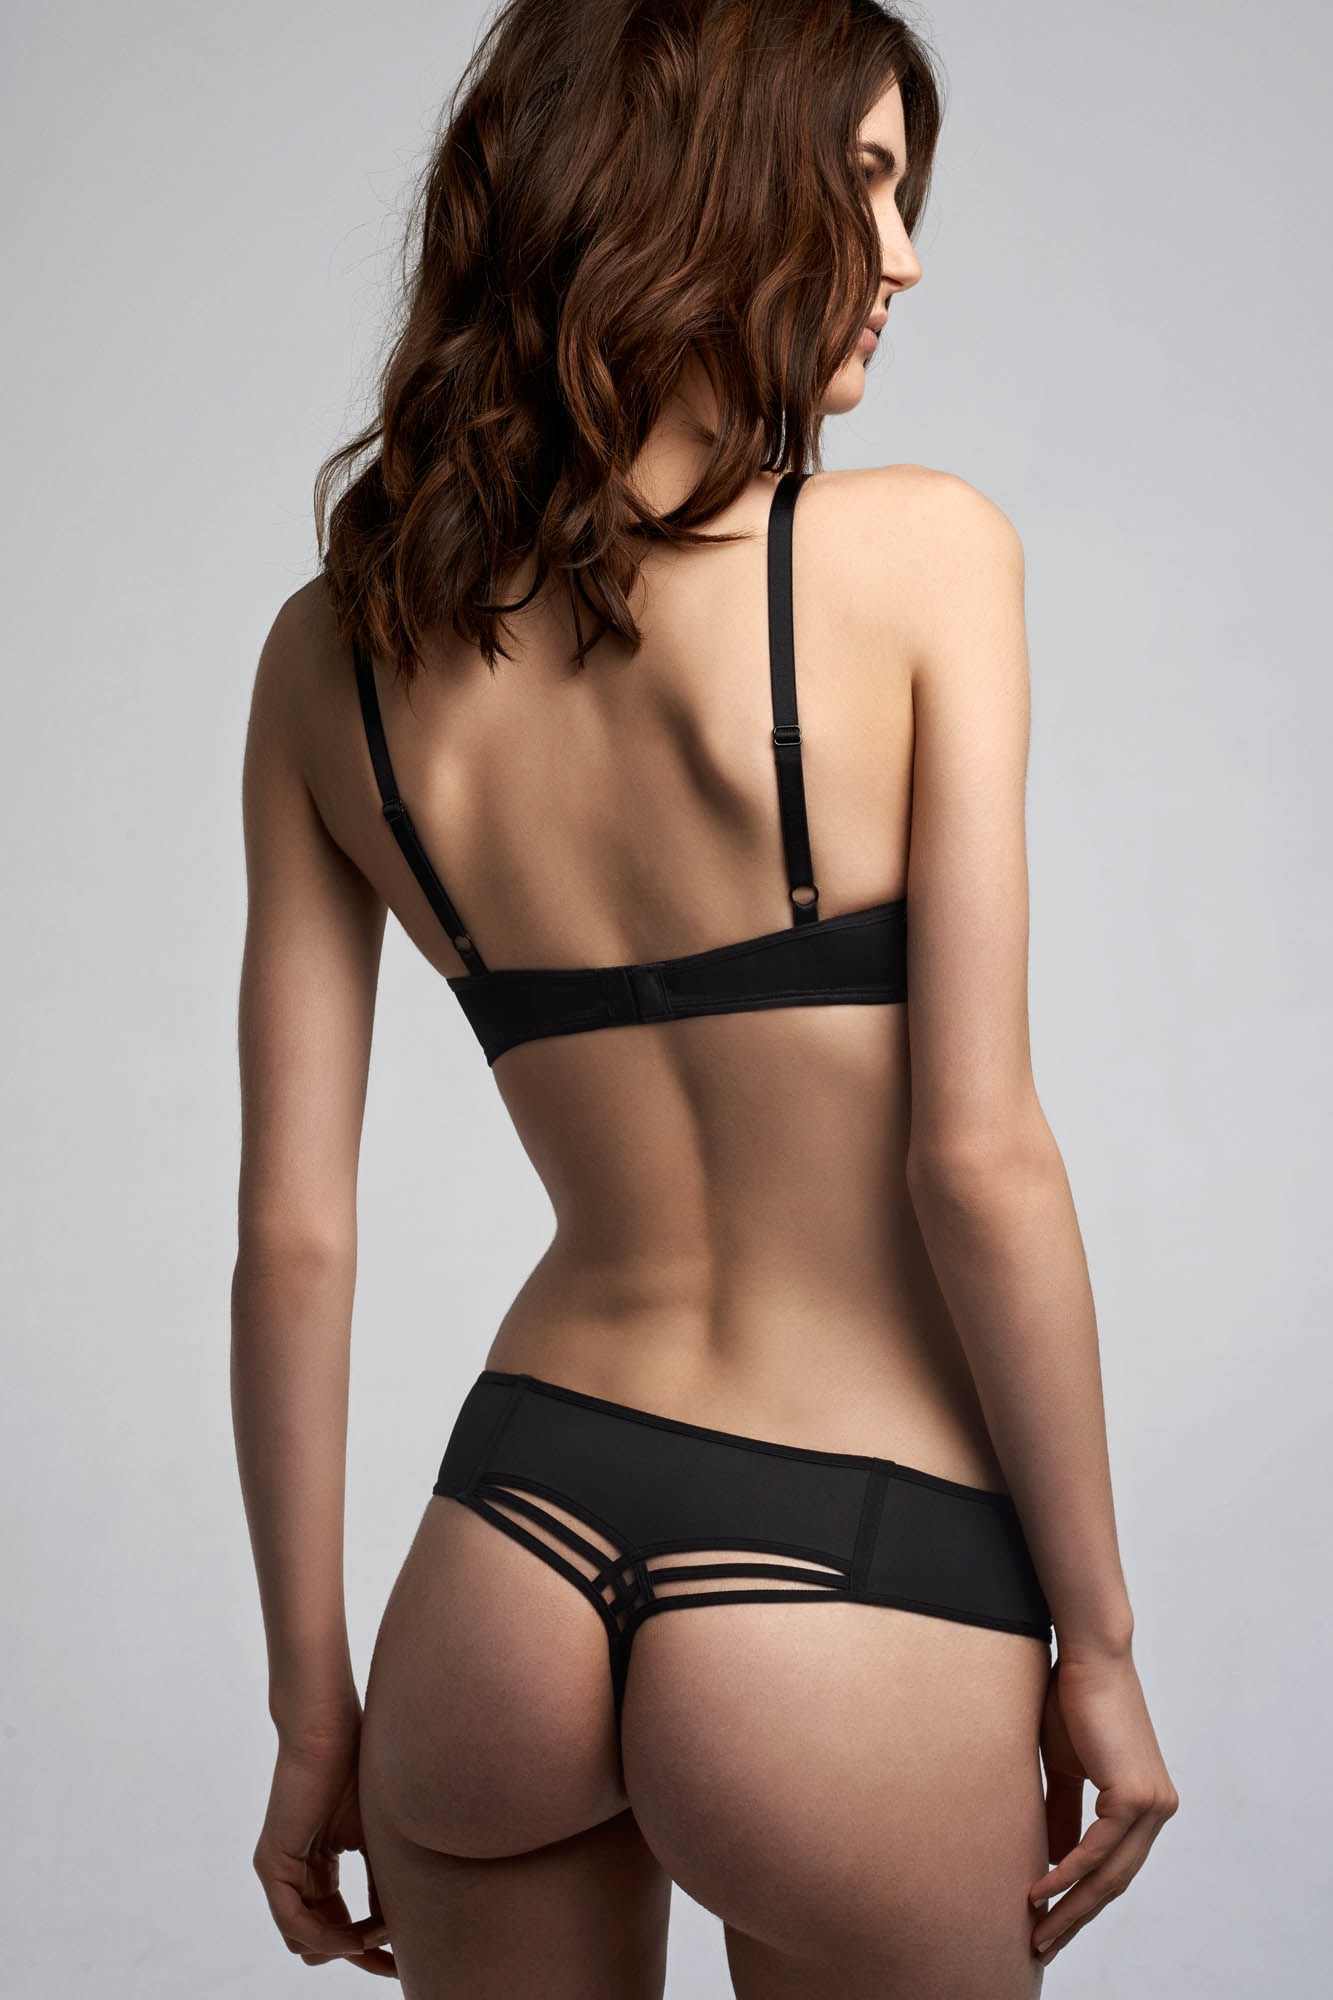 Dame De Paris 7cm Thong - Black | Brands, Marlies Dekkers, LINGERIE & KLÄDER, SEXIGA UNDERKLÄDER, Sexiga Trosor | Intimast.se - Sexleksaker